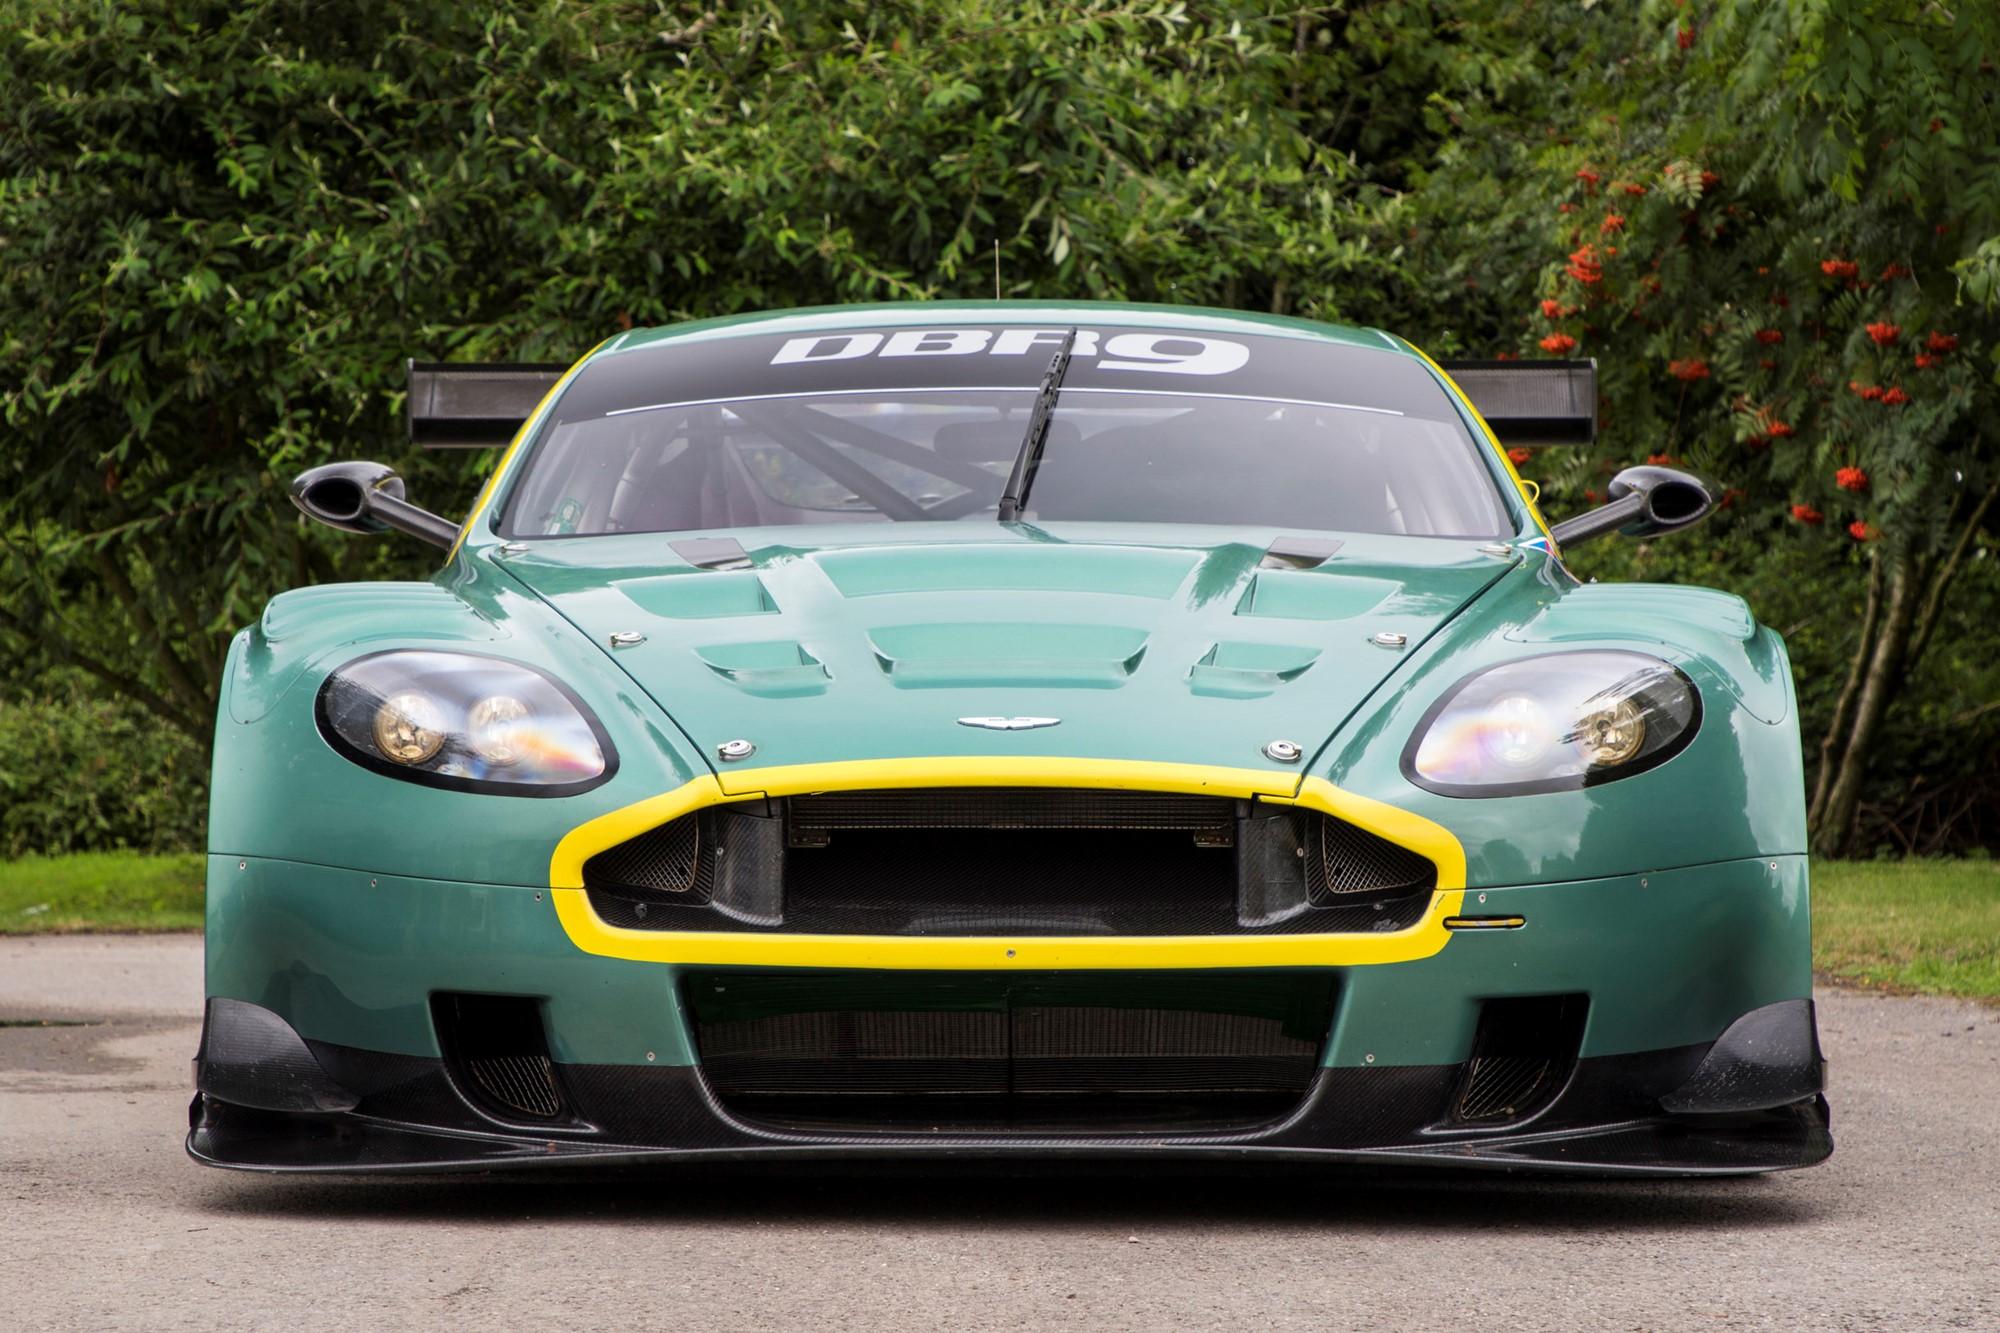 2005 Aston Martin Dbr9 Previously Sold Fiskens